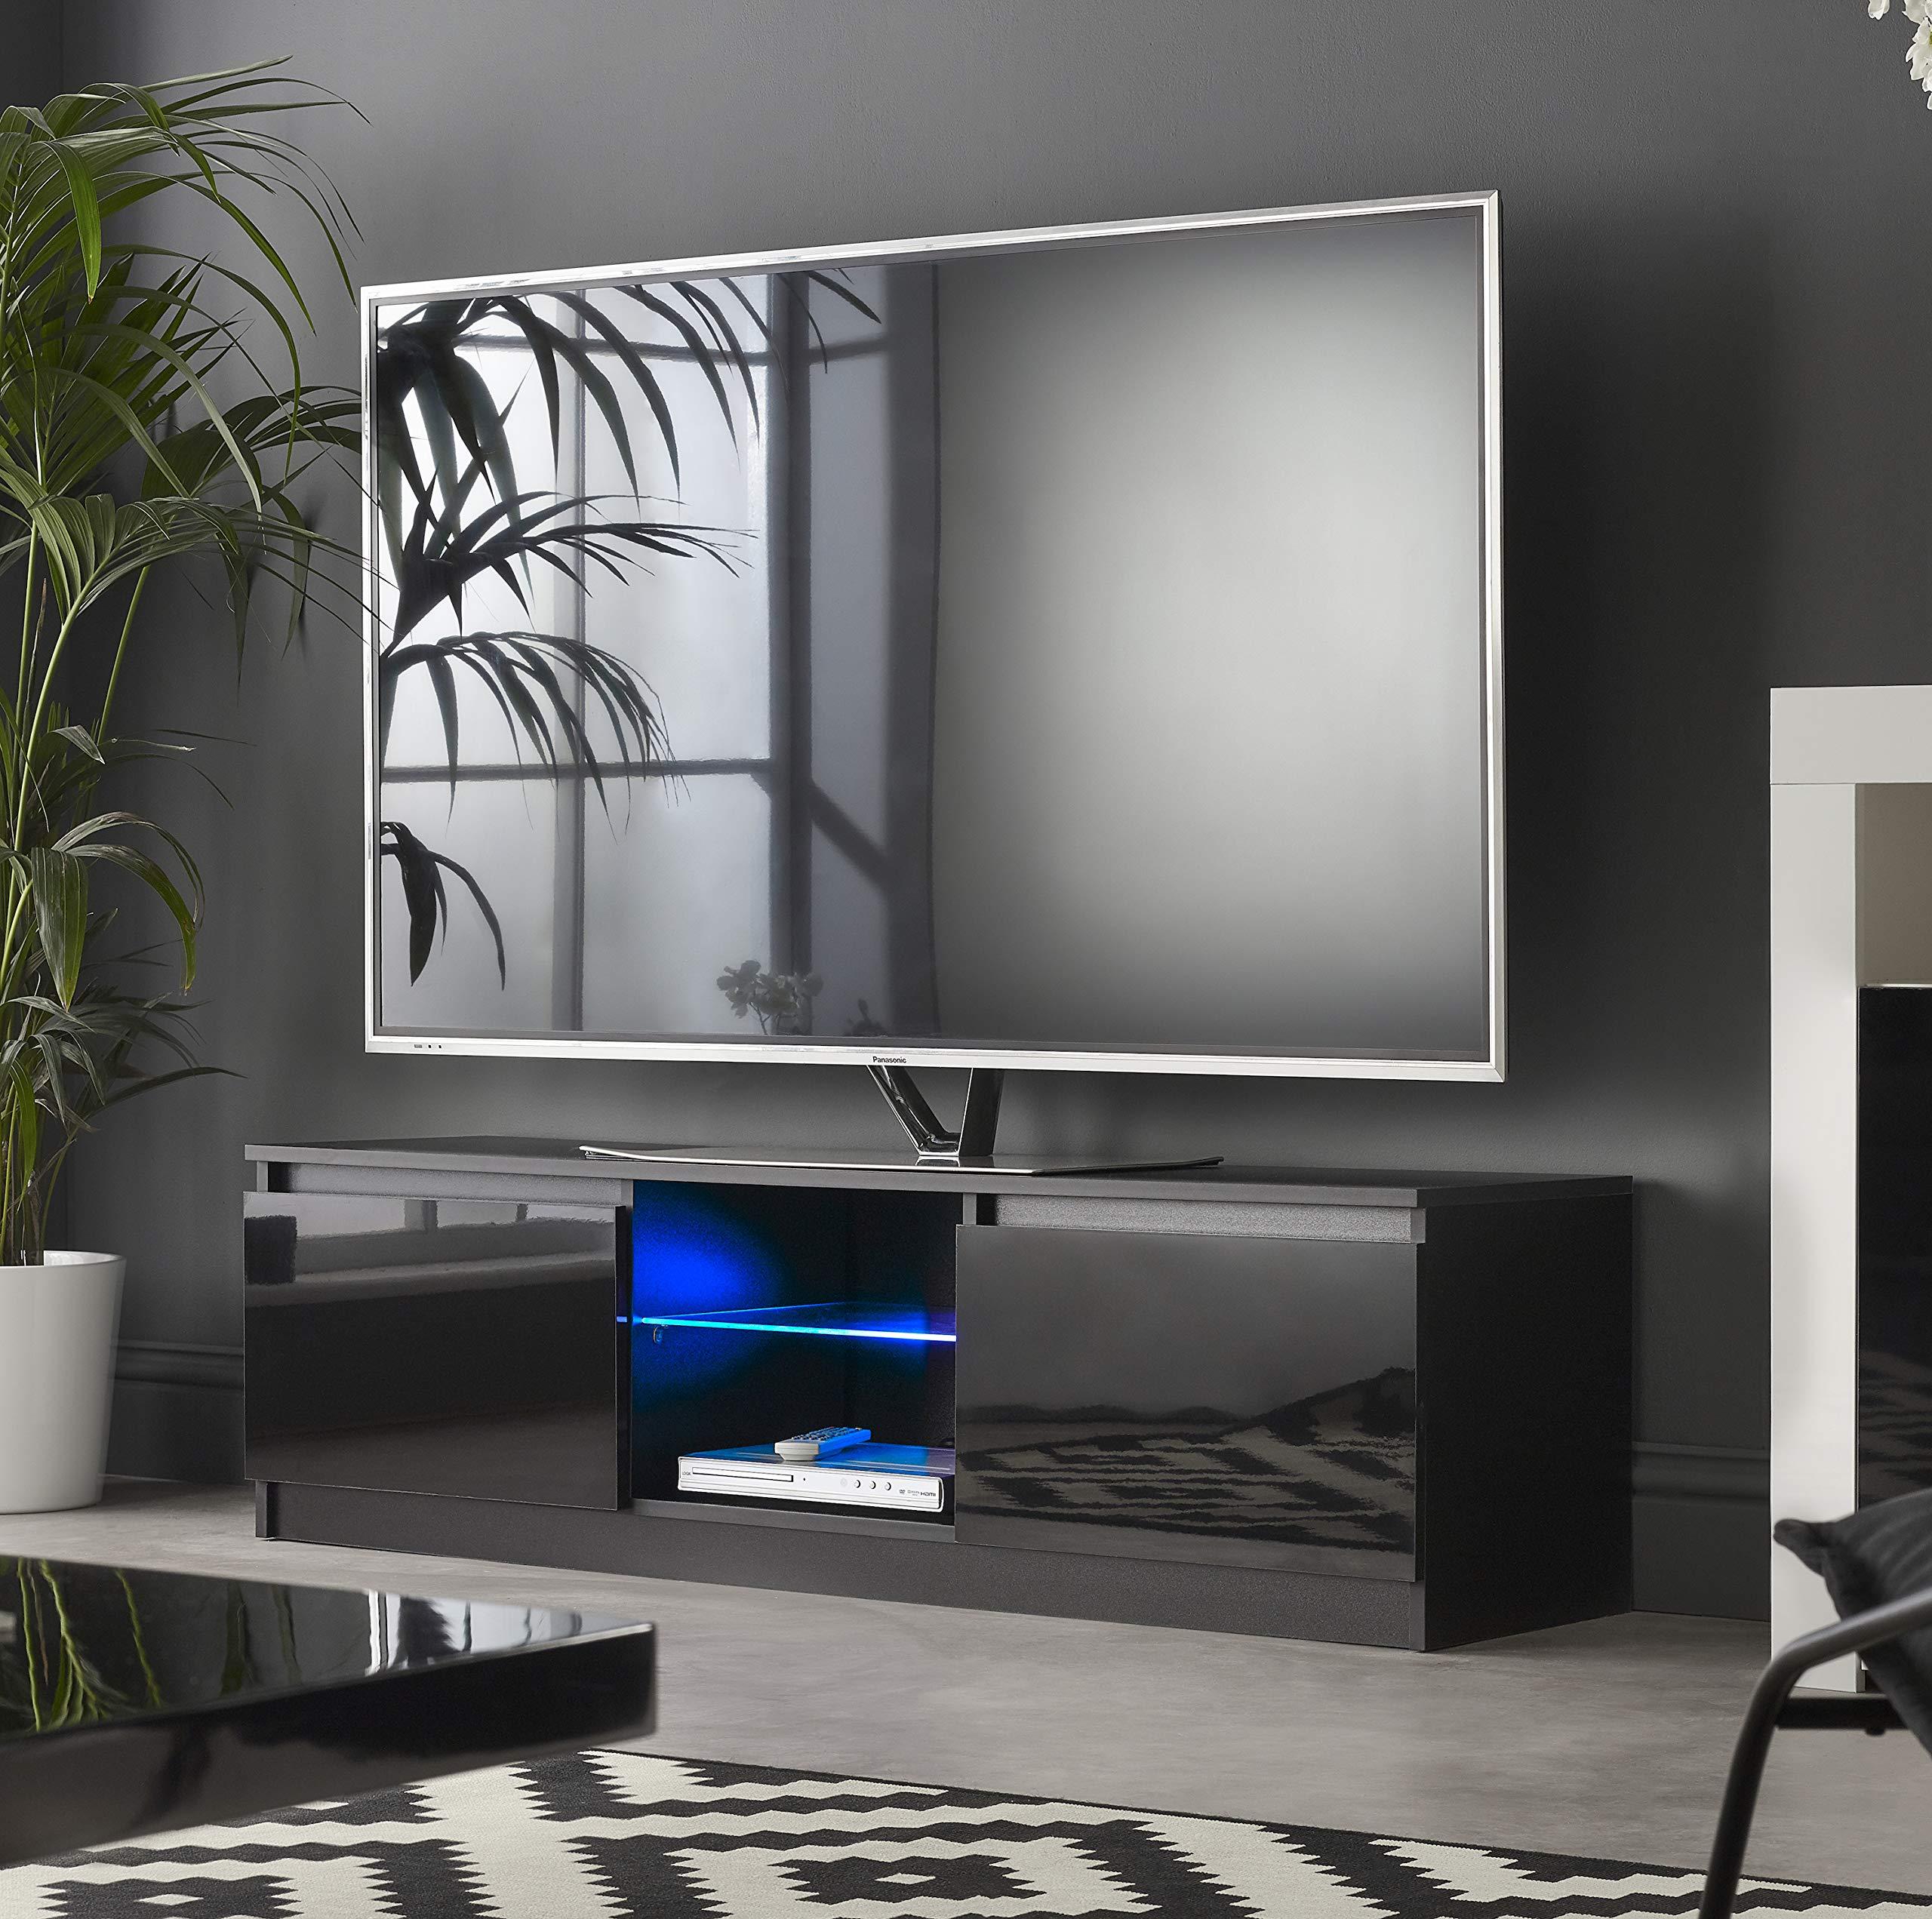 MMT RTV 1200 - Mueble de TV con Luces LED Azules para TV de 40 49 50 Pulgadas 4K de 120 cm de Ancho: Amazon.es: Electrónica